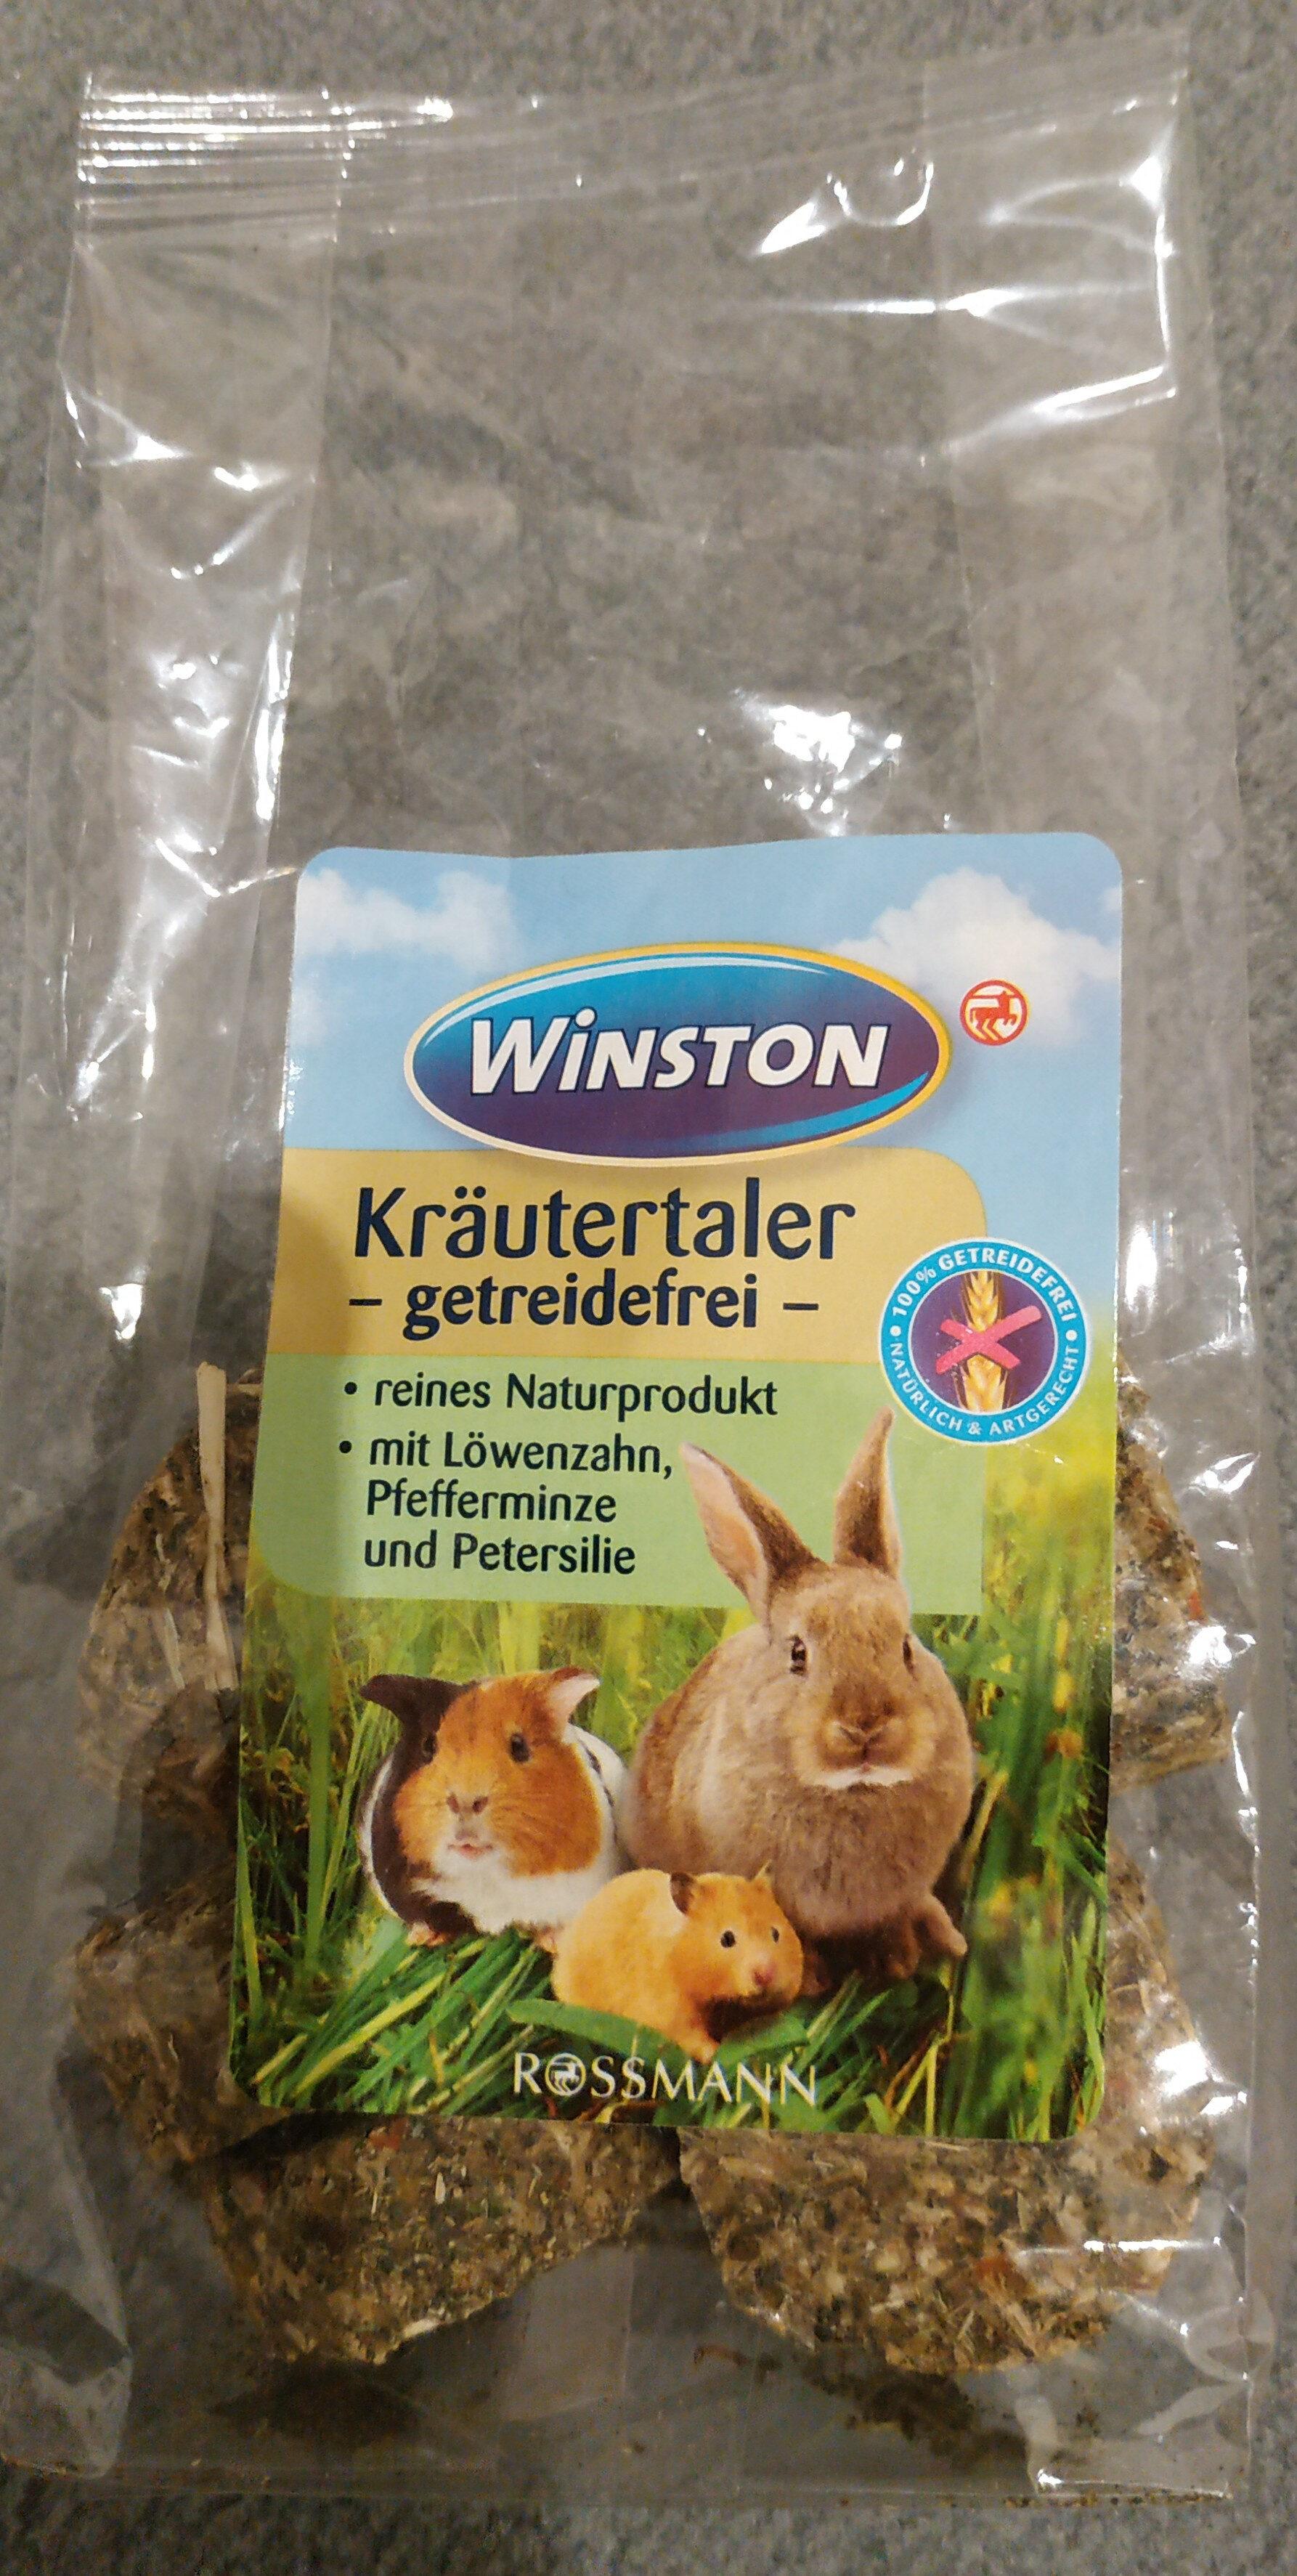 Kräutertaler -getreidefrei- - Product